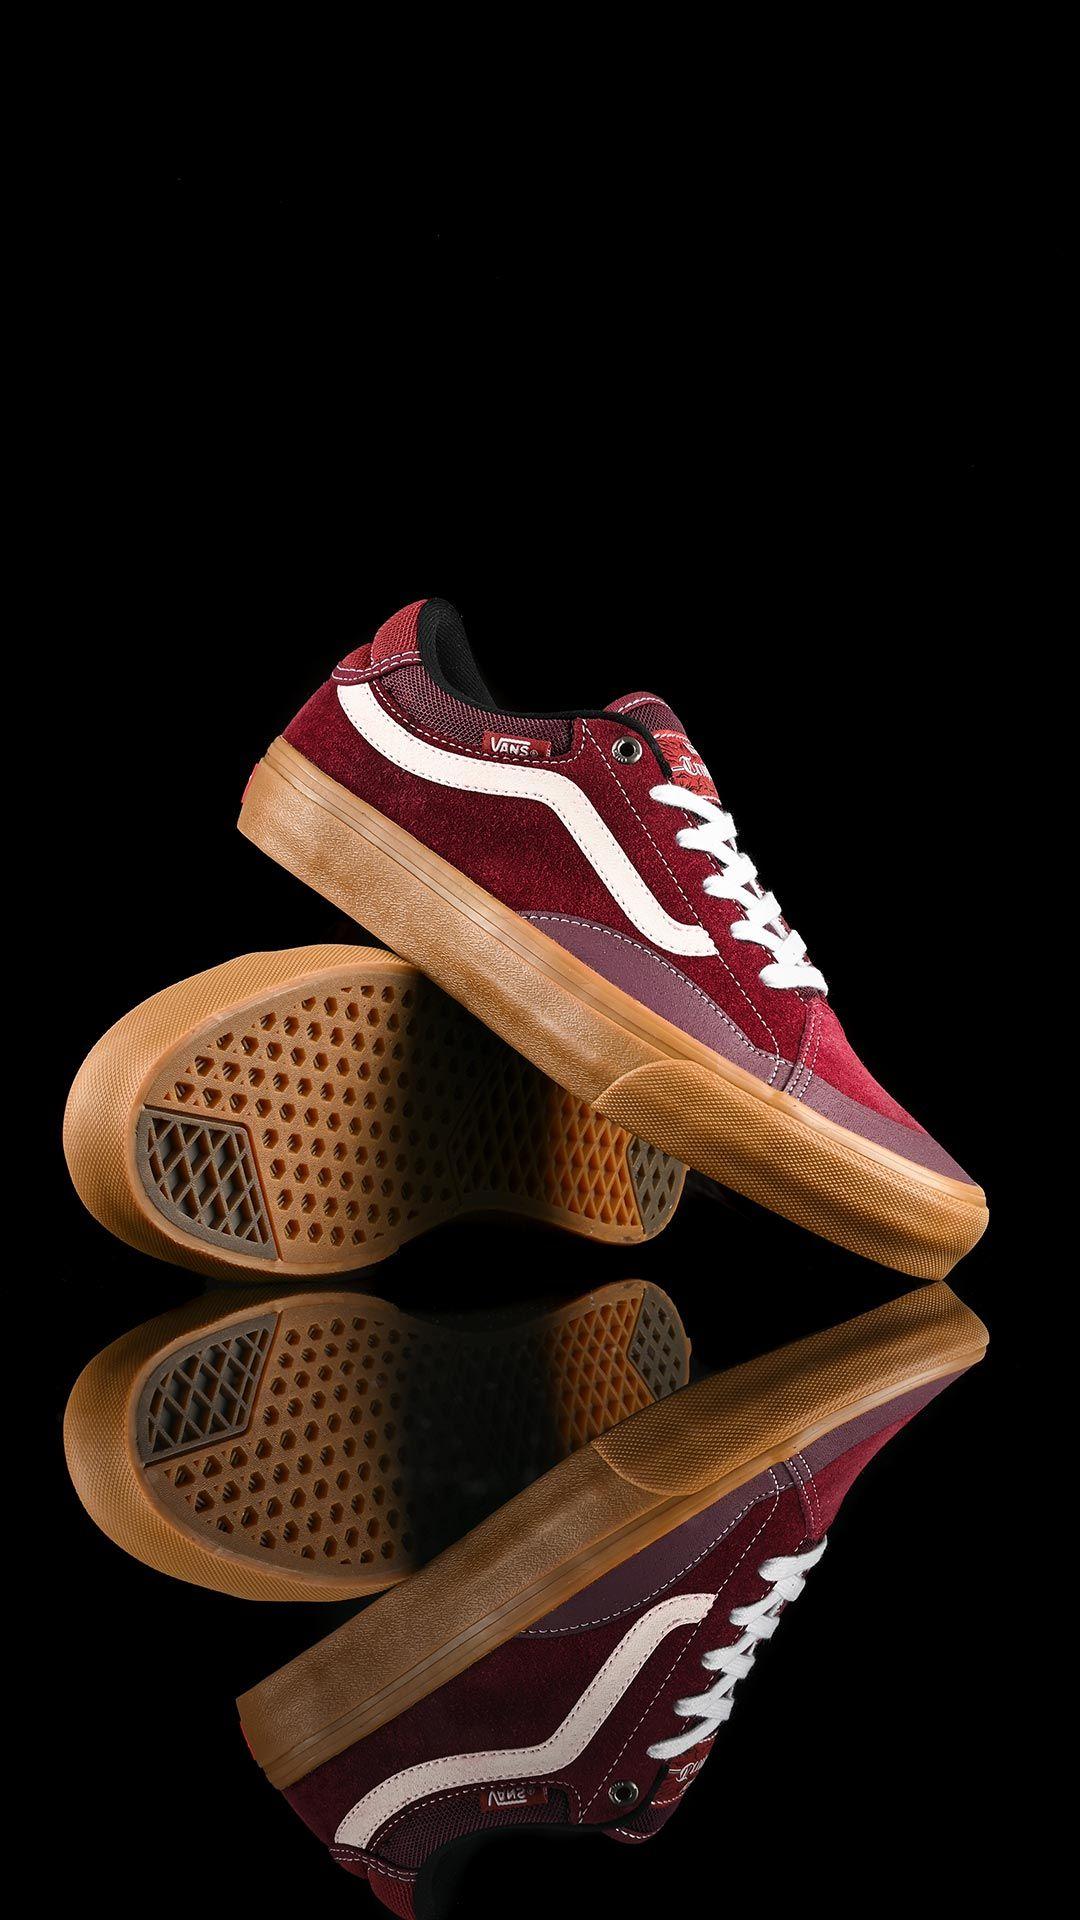 Vans TNT Pro Skate Shoes in 2020